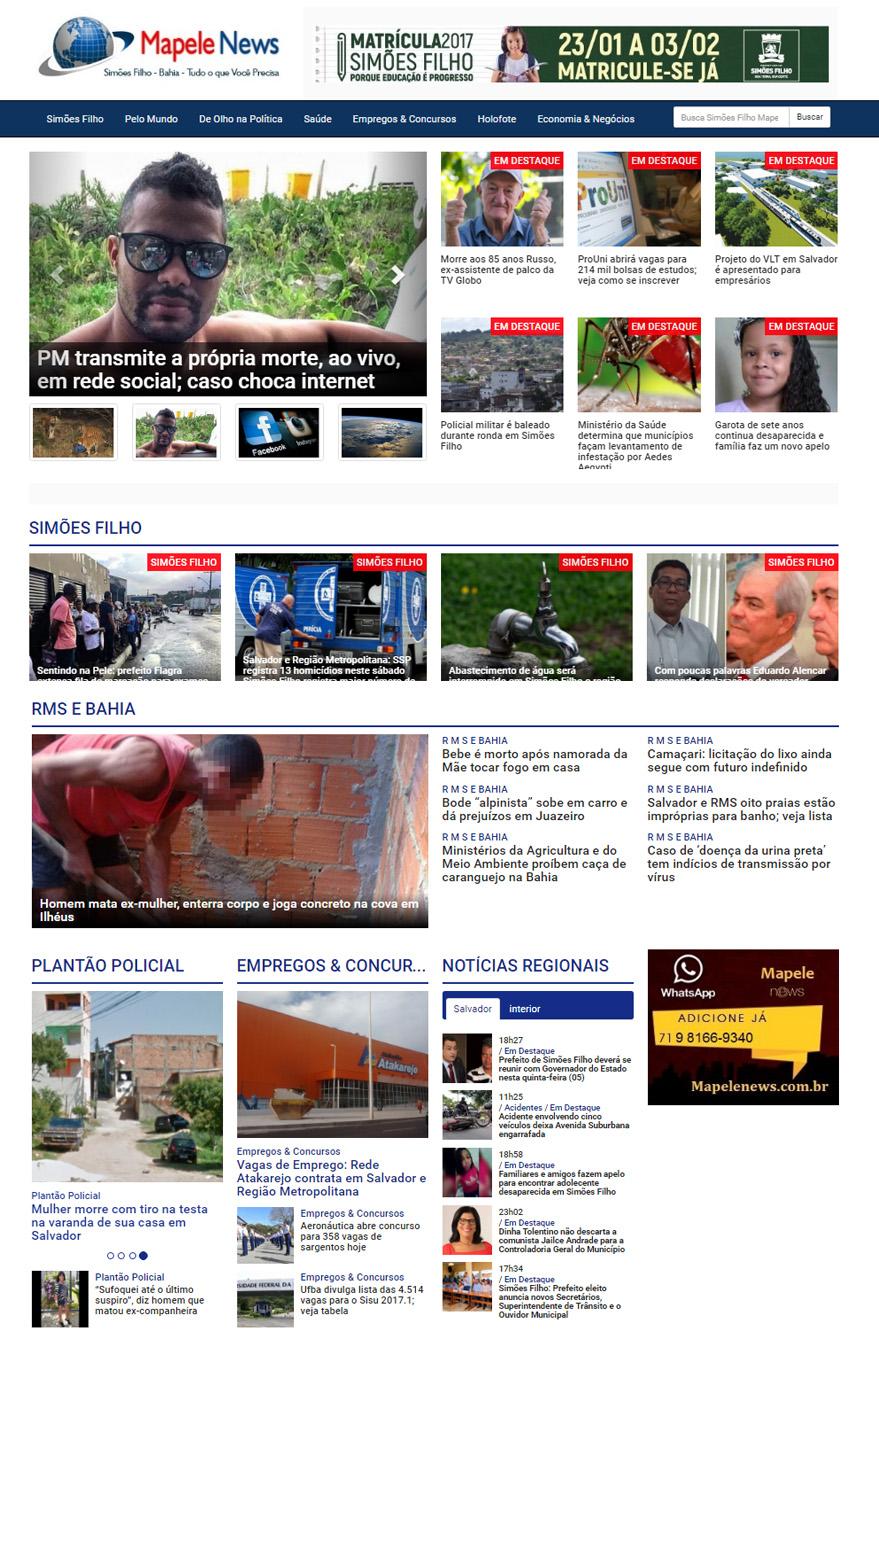 mapele news